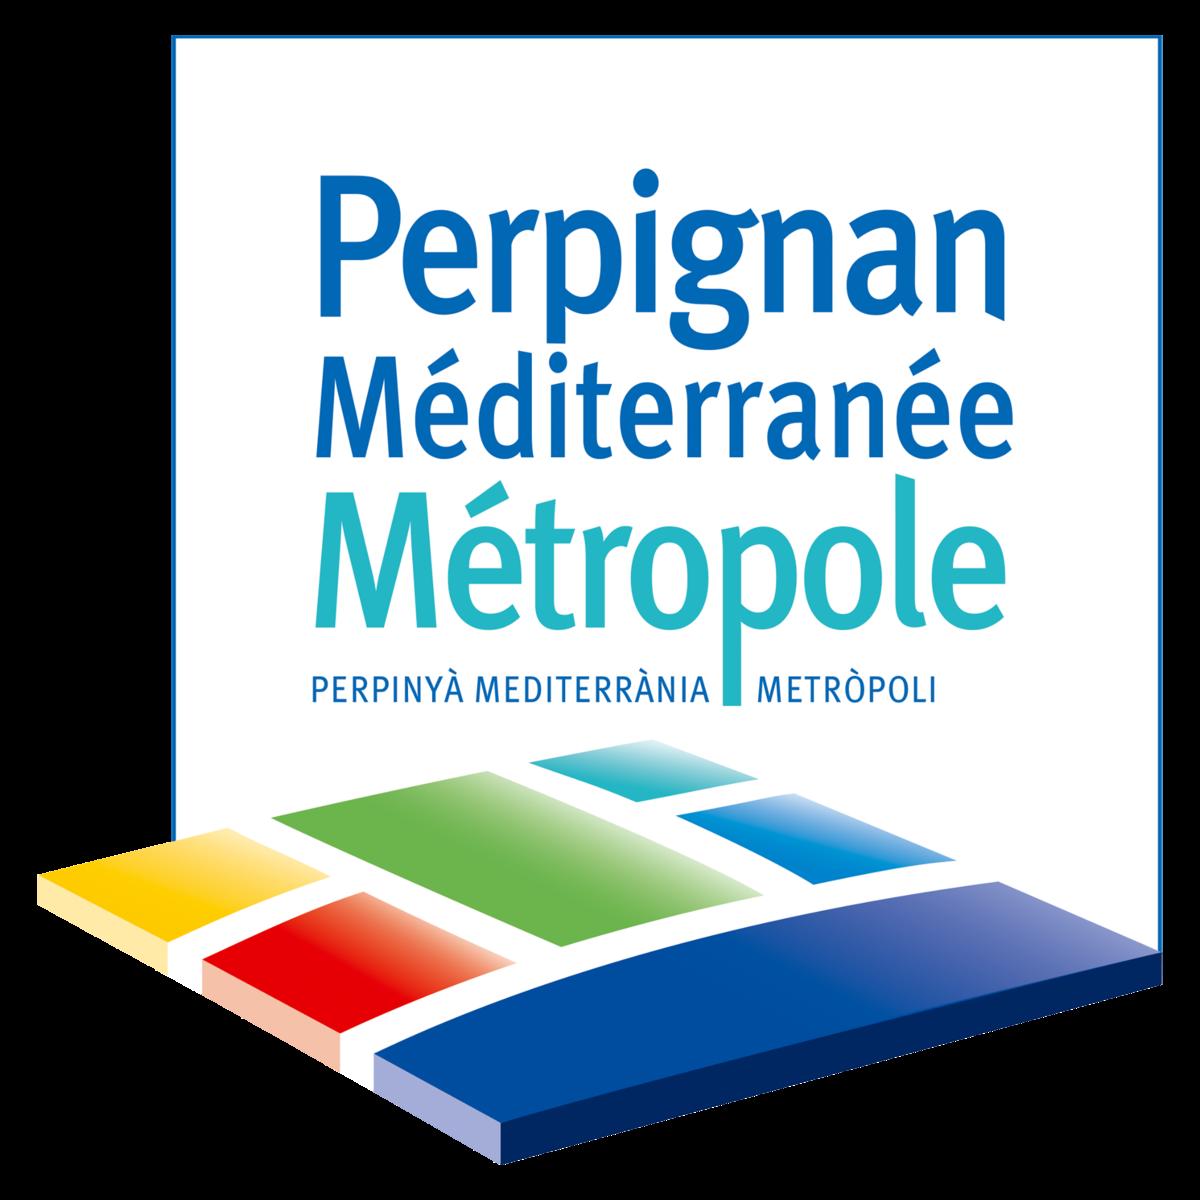 Perpignan_Méditerranée_Métropole_2016